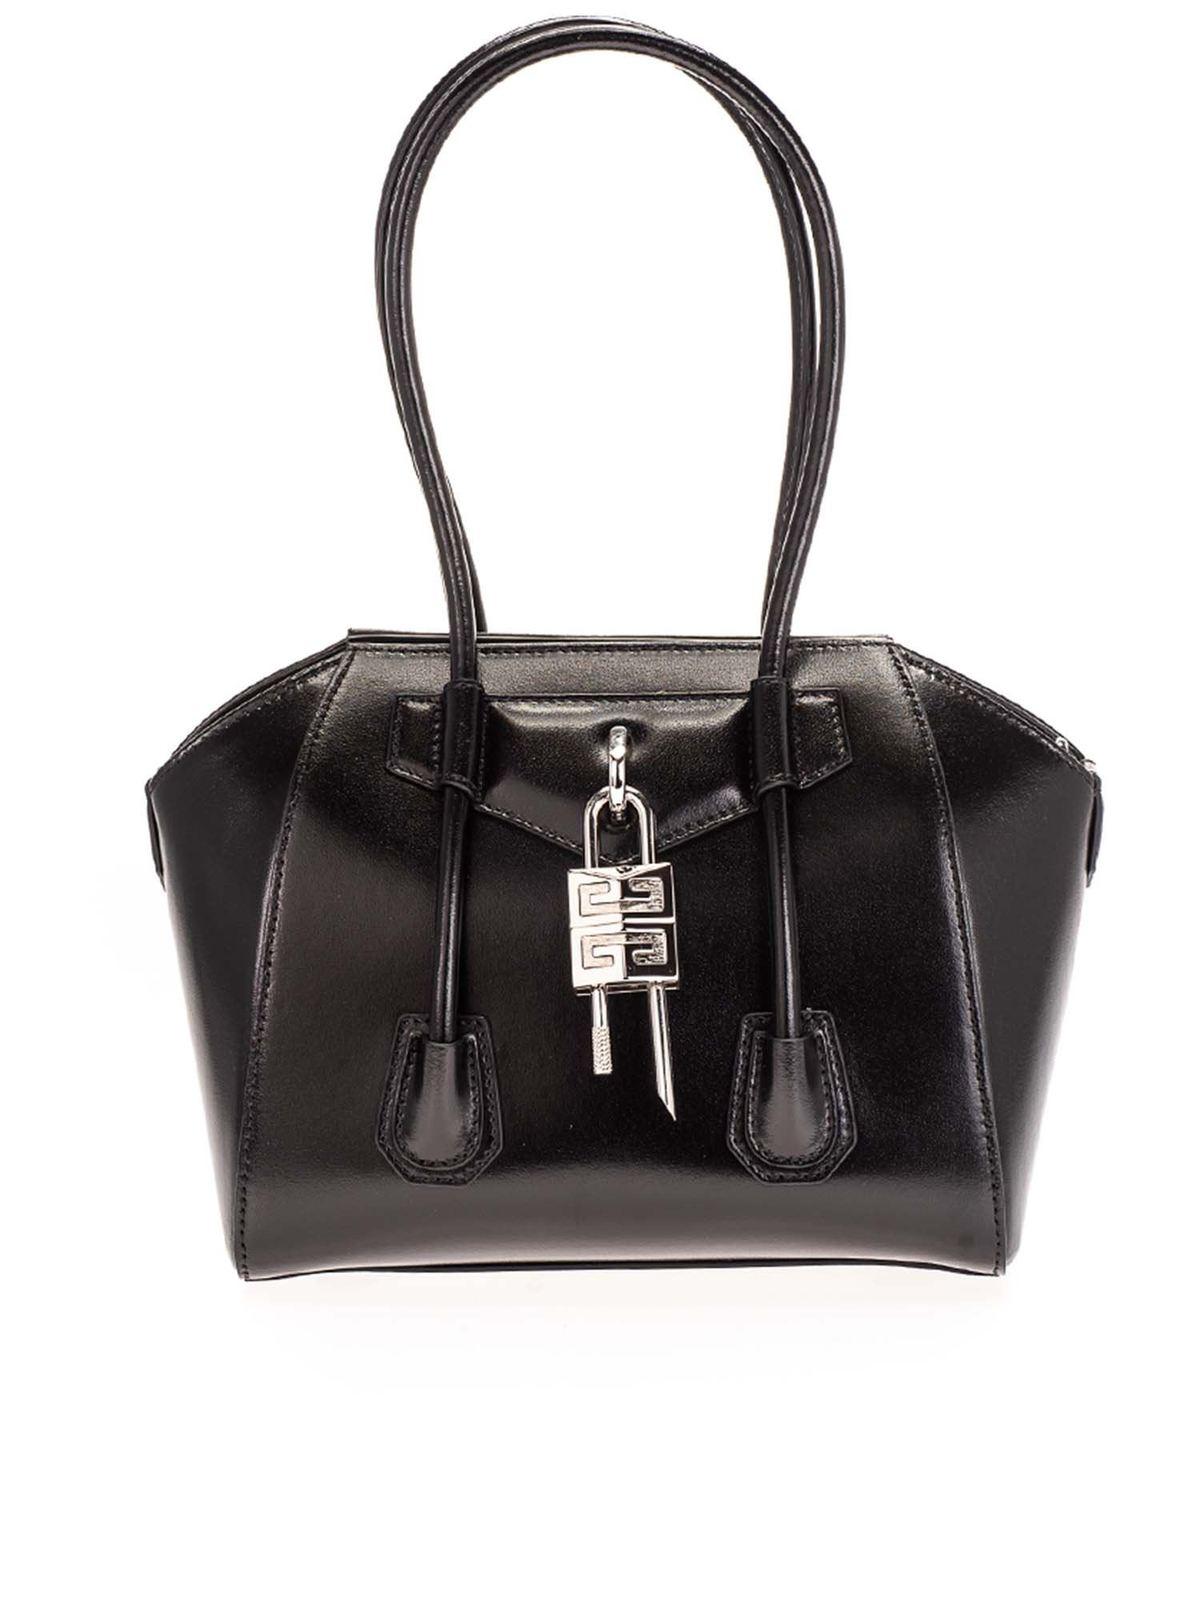 Givenchy Leathers MINI ANTIGONA LOCK BAG IN BLACK